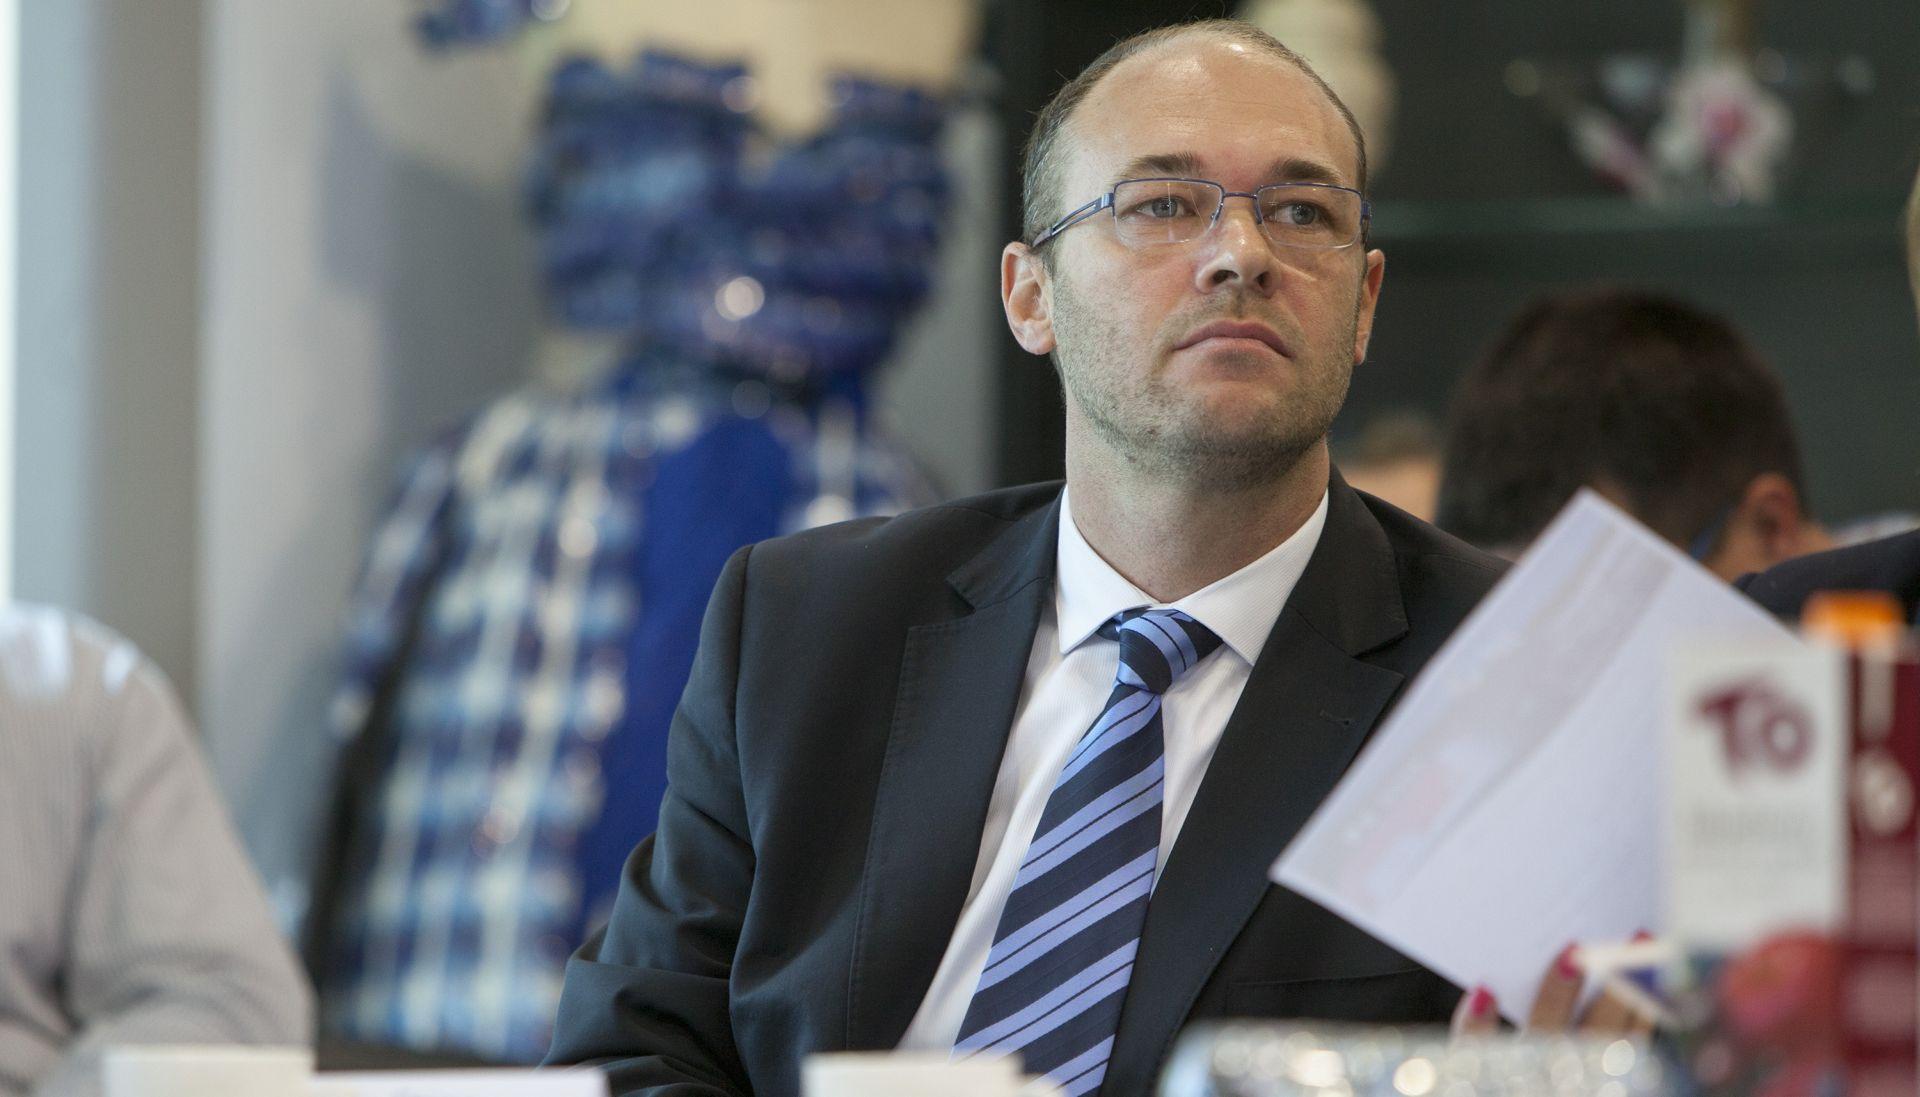 Stier: Hrvatskoj treba nova razvojna paradigma